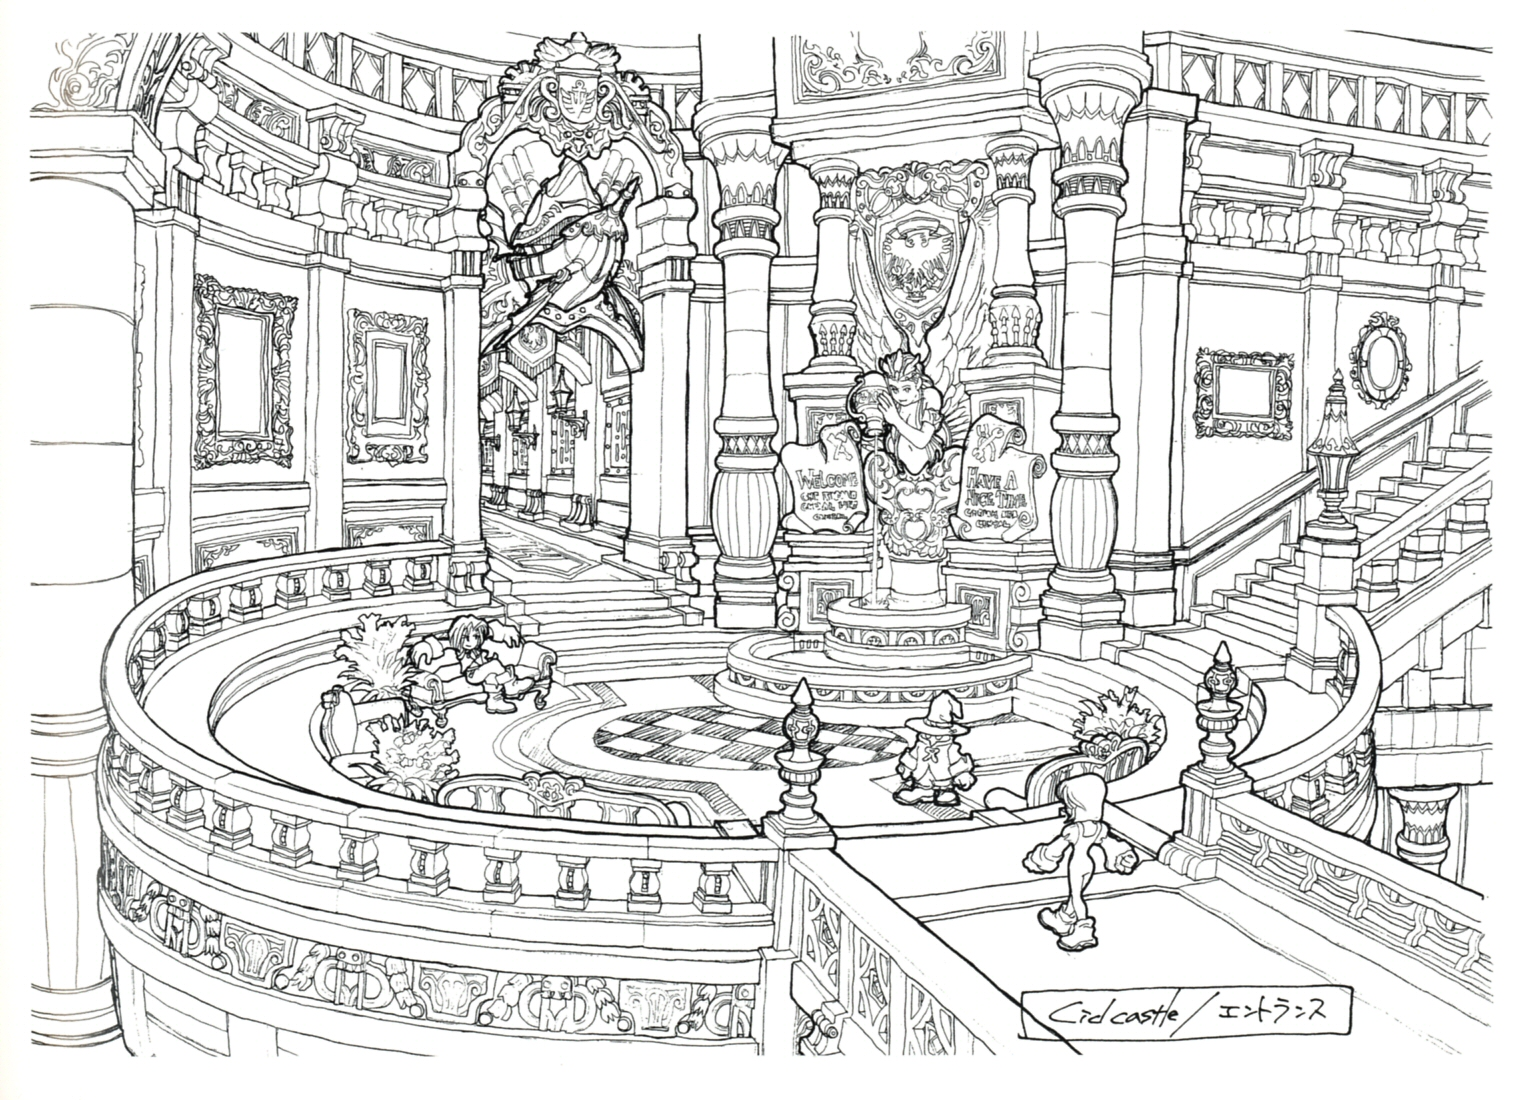 Foyer Layout Generator : Image lindblum castle entrance hallway ff art g the